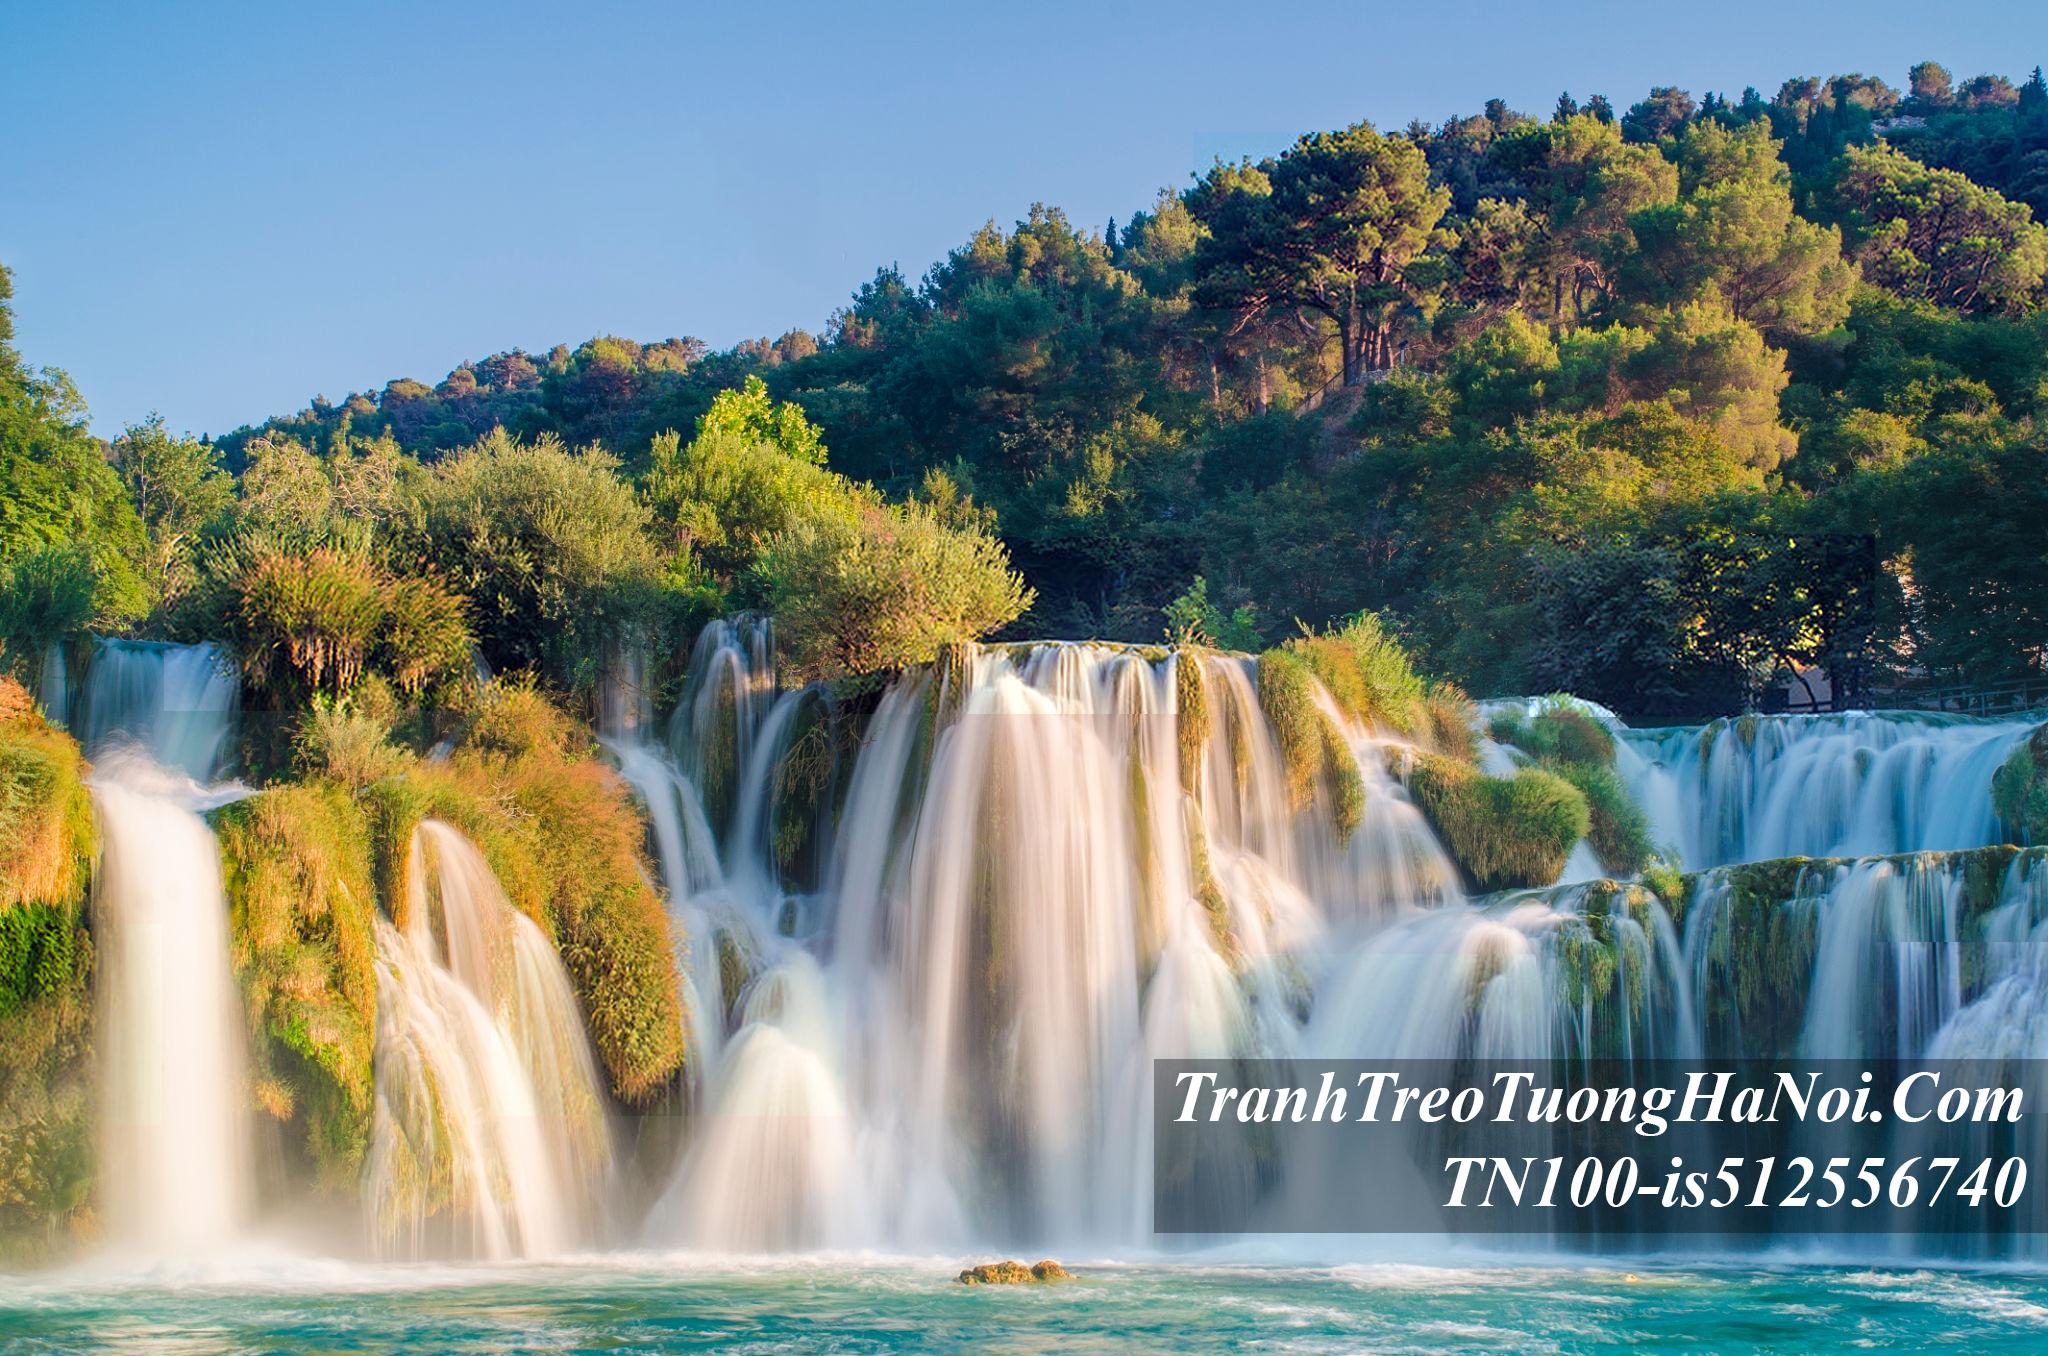 Tranh thac nuoc dep do tu tren cao xuong TN100-is512556740